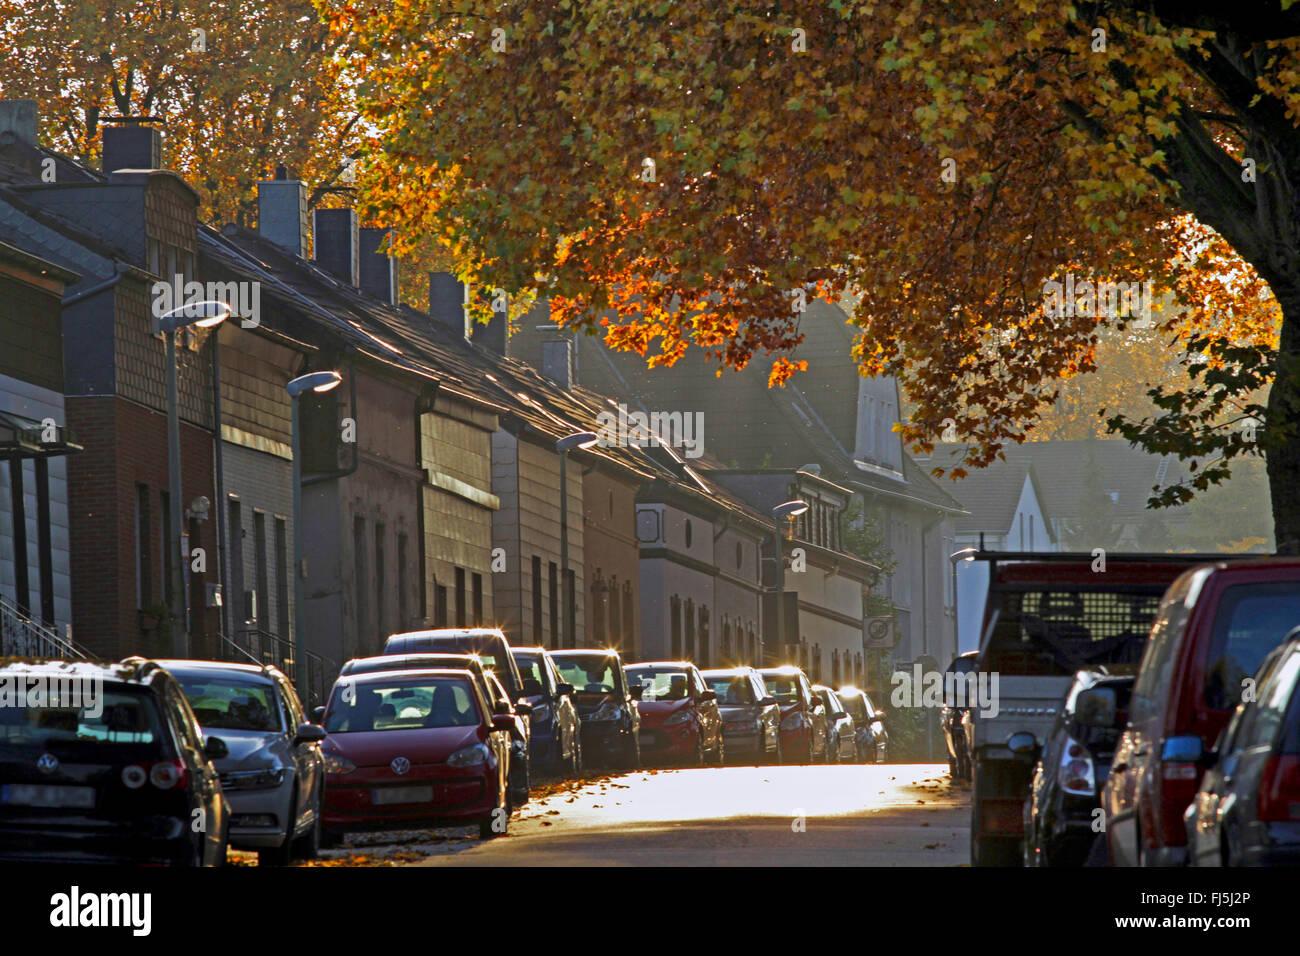 residental zone of miners in autumn, Essen Kray, Germany, North Rhine-Westphalia, Ruhr Area, Essen - Stock Image